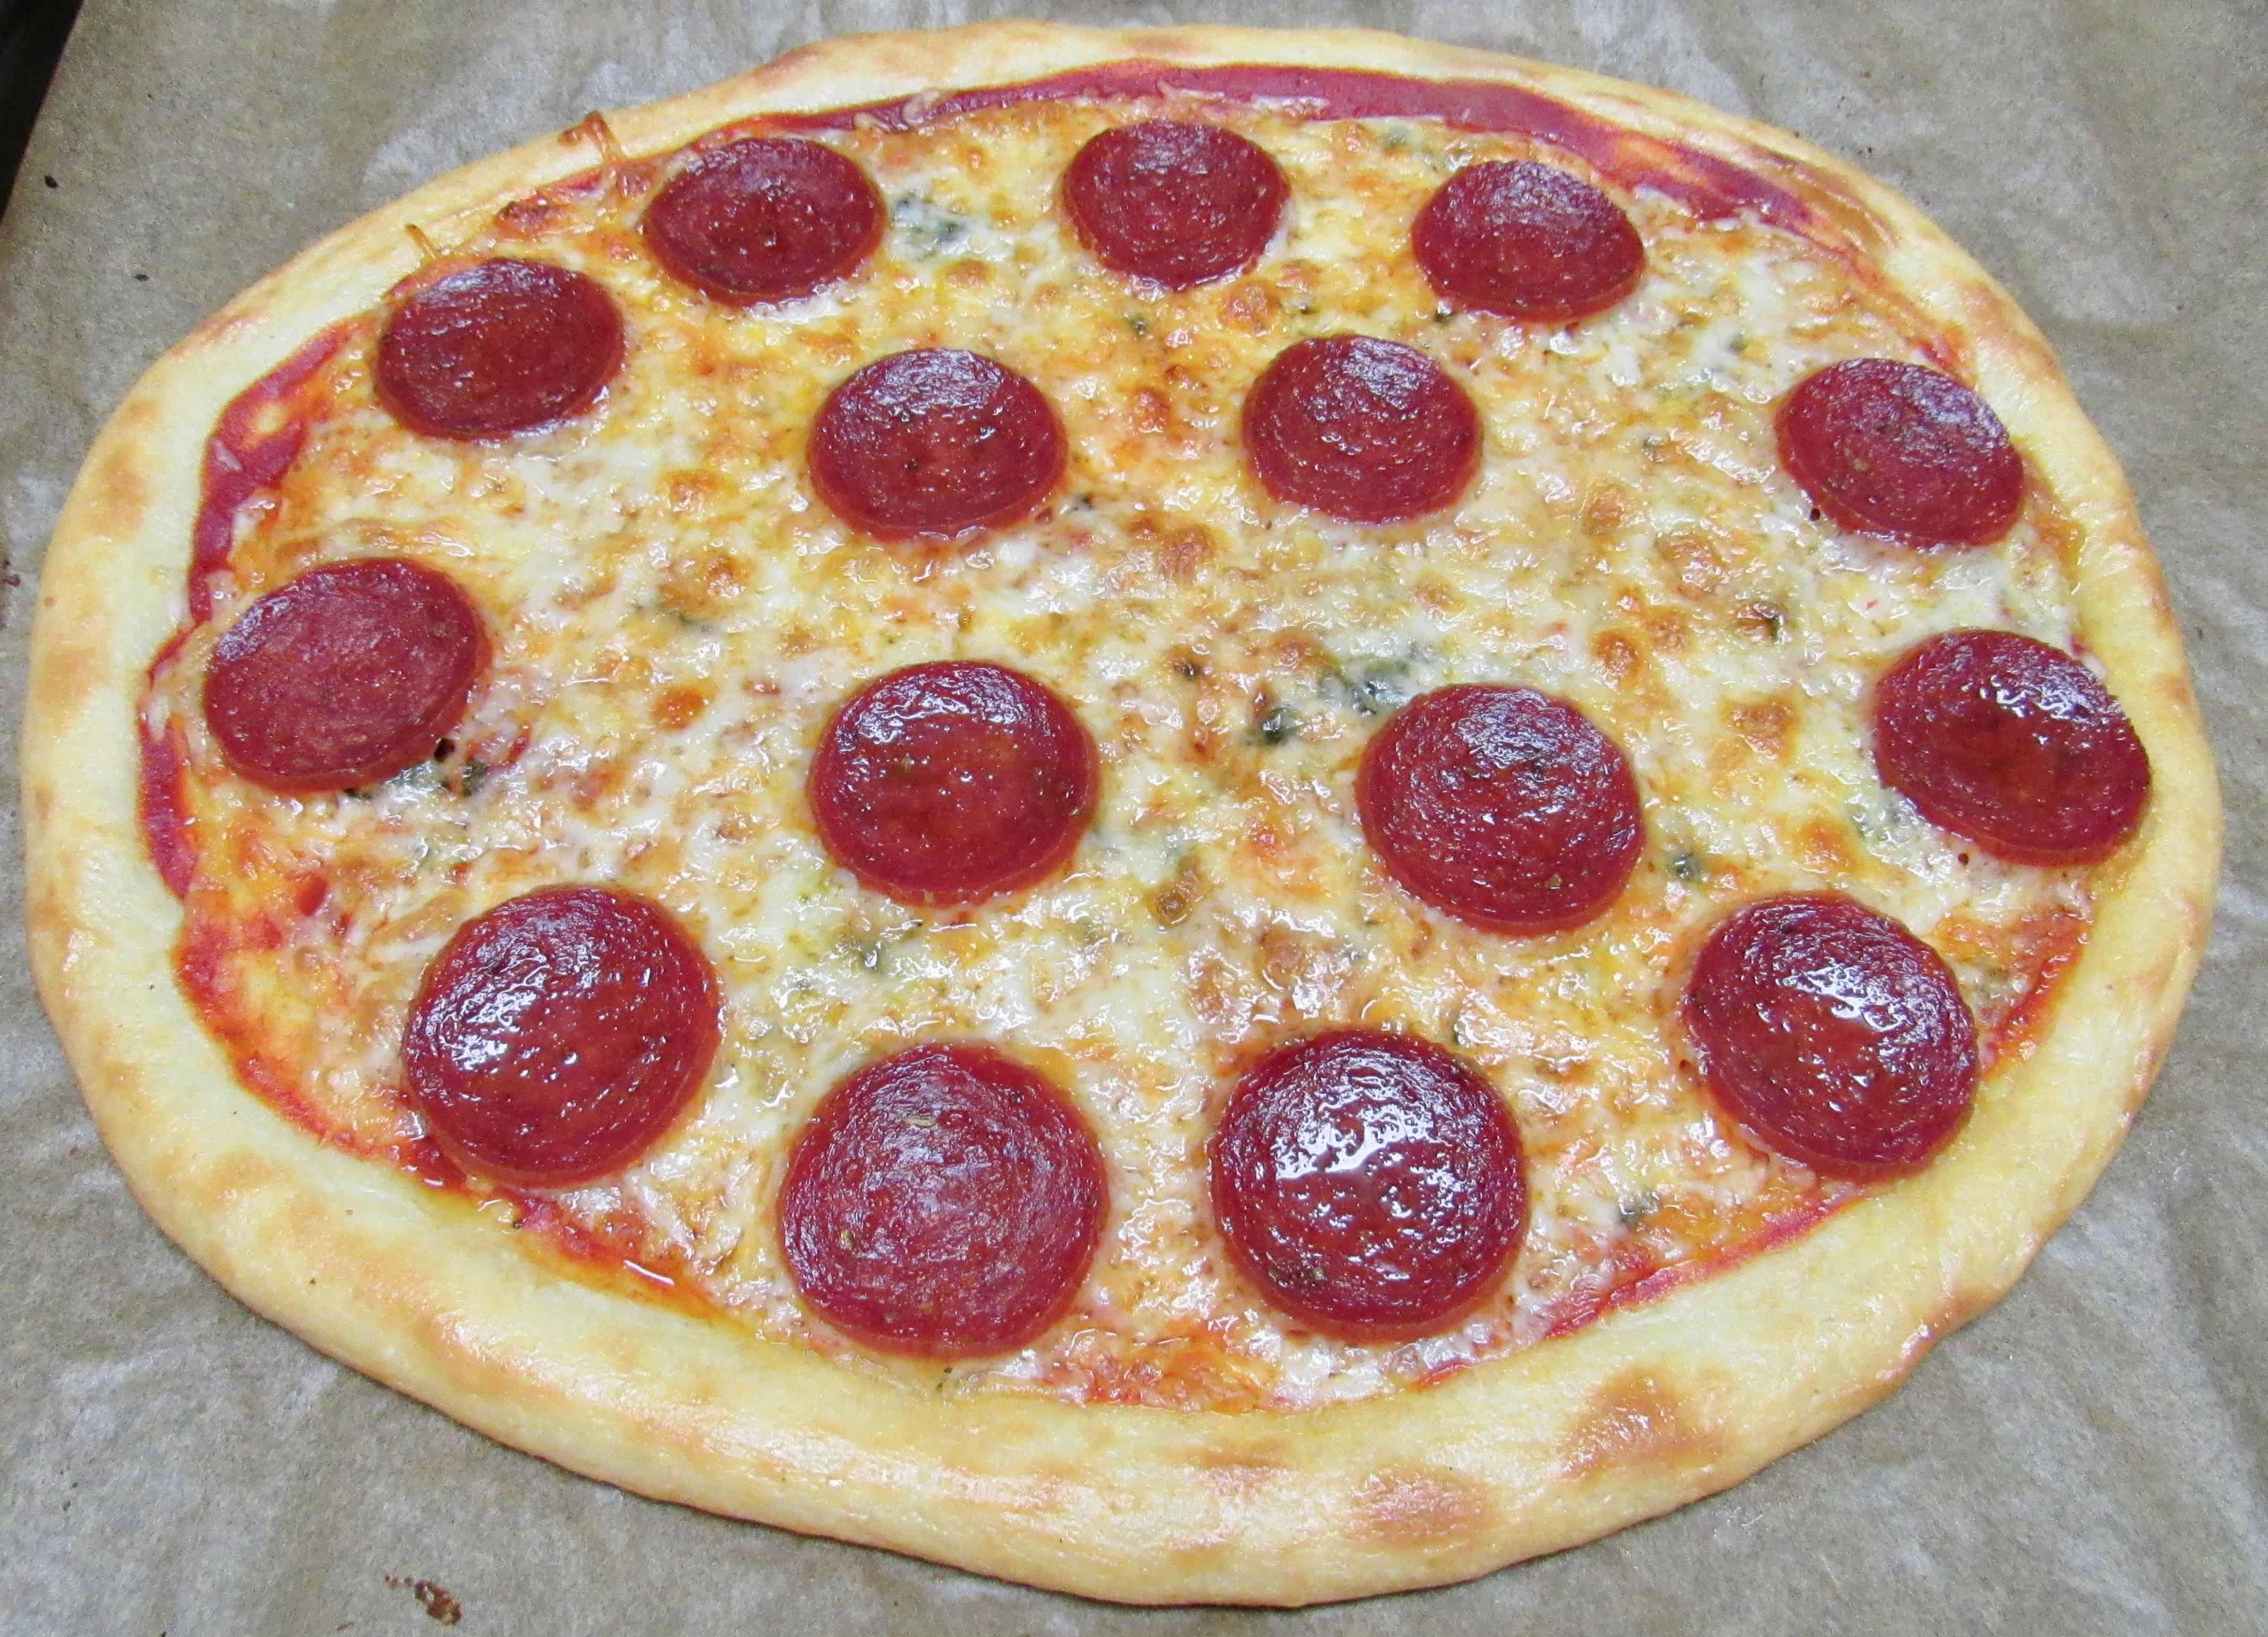 Keto Low Carb & Gluten Free Fathead Pepperoni Pizza